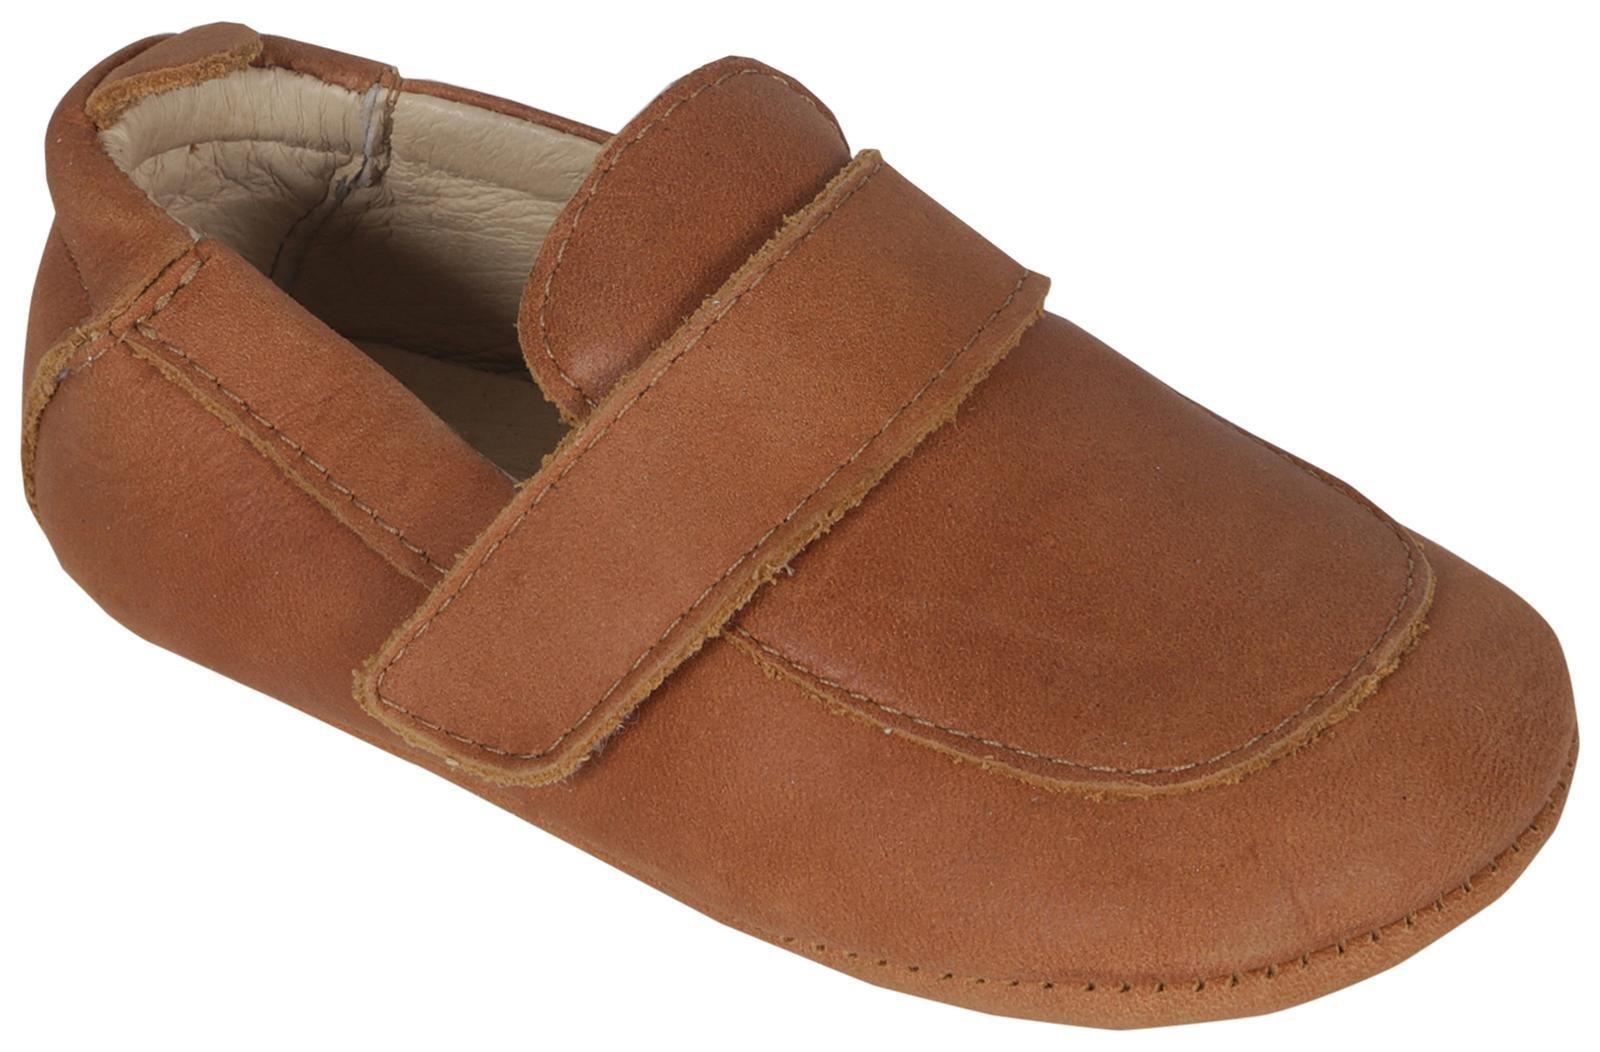 Old Soles Boys' Global Shoe - K, Tan, 18 EU(2 M US Infant) by Old Soles